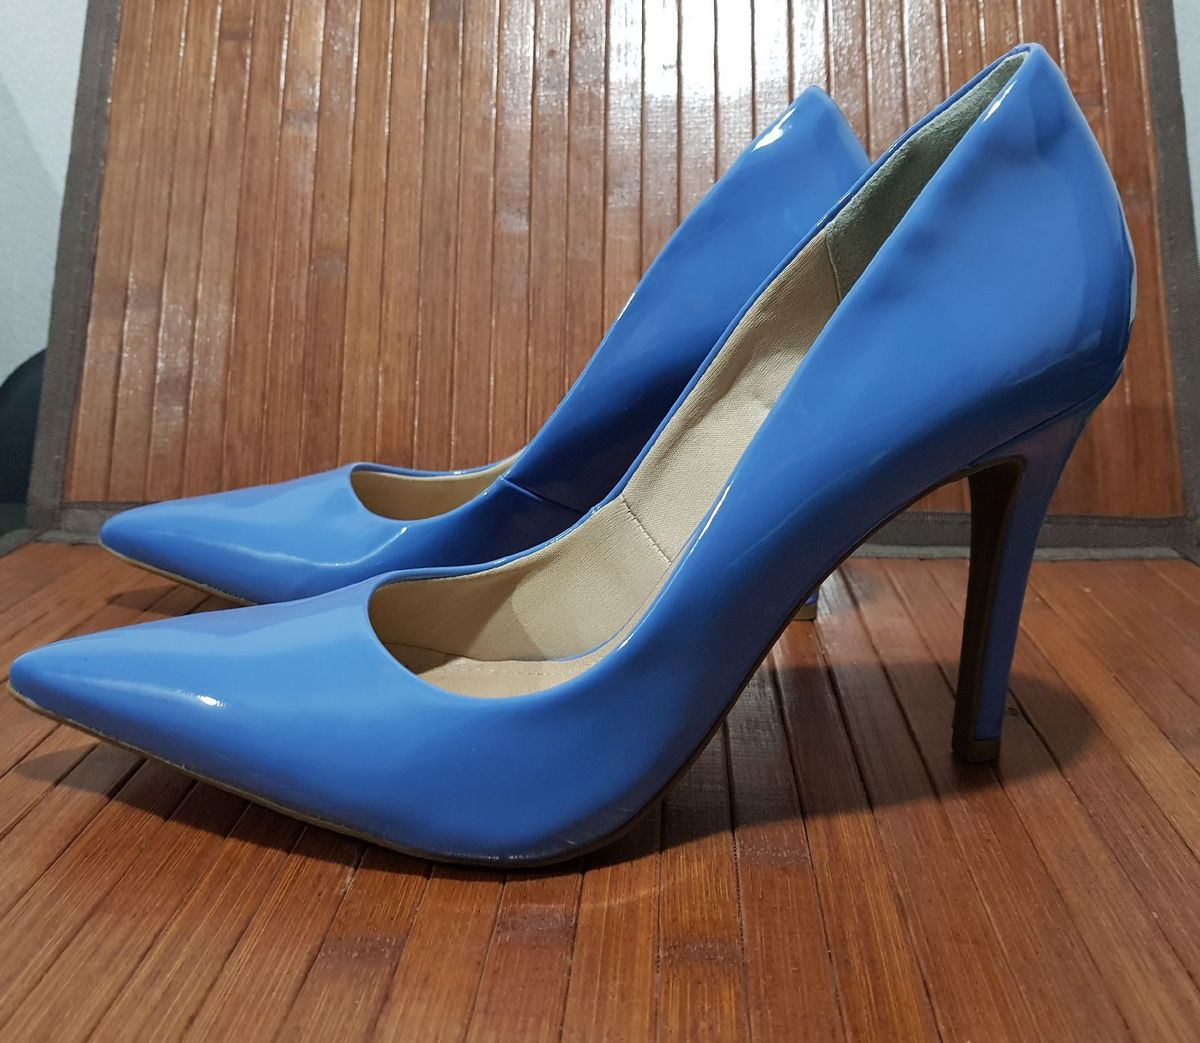 3ff88693ba scarpin azul vinil - sapatos bebece.  Czm6ly9wag90b3muzw5qb2vplmnvbs5ici9wcm9kdwn0cy81mde5mjy2lza5mgfhyjiyztjjmdu5ytvjmgyyytgzmgmxmgm1nji2lmpwzw  ...